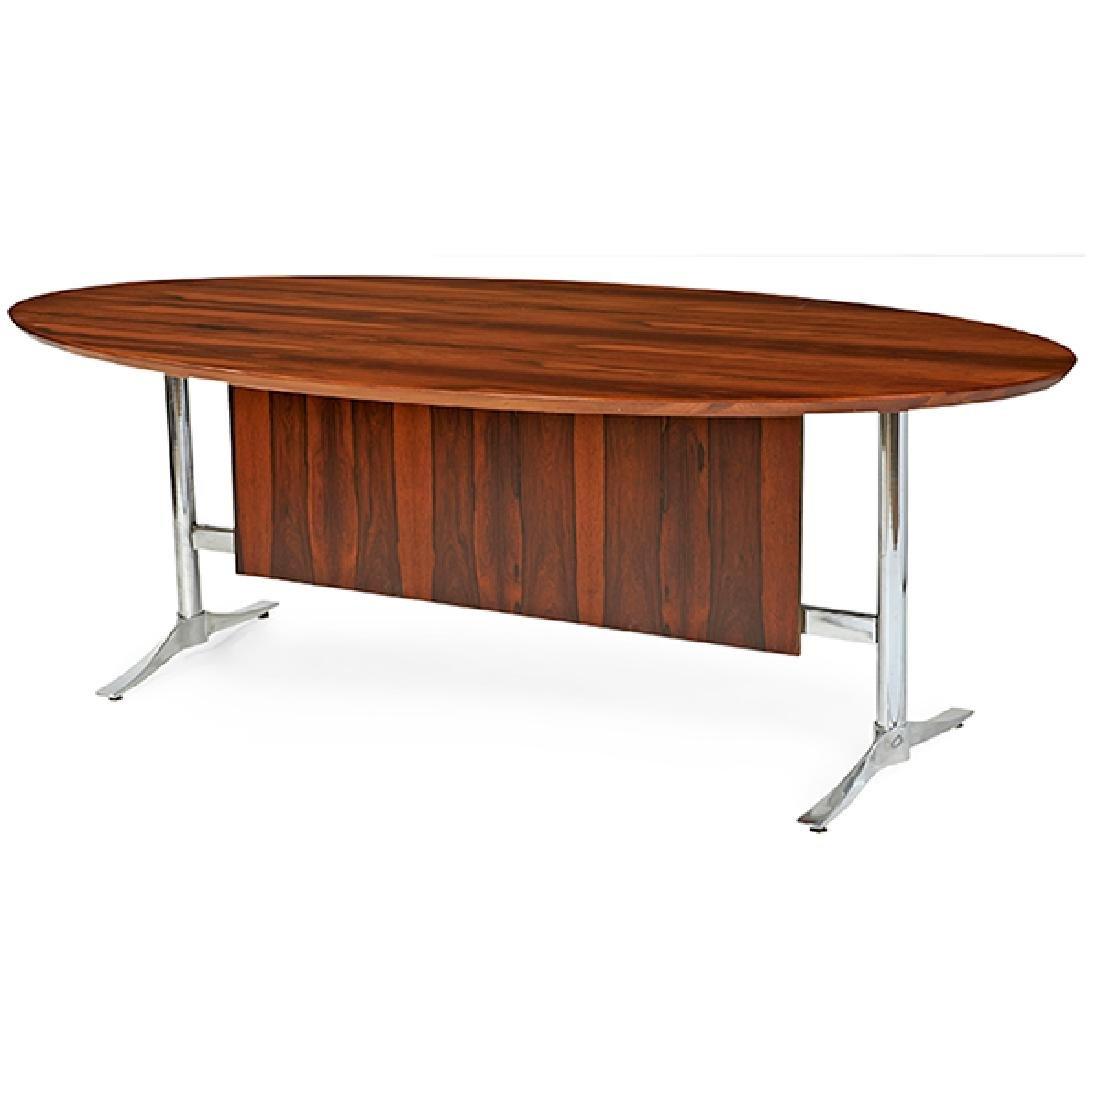 Mid-century Modern, desk, USA, 1960s, rosewood, steel,